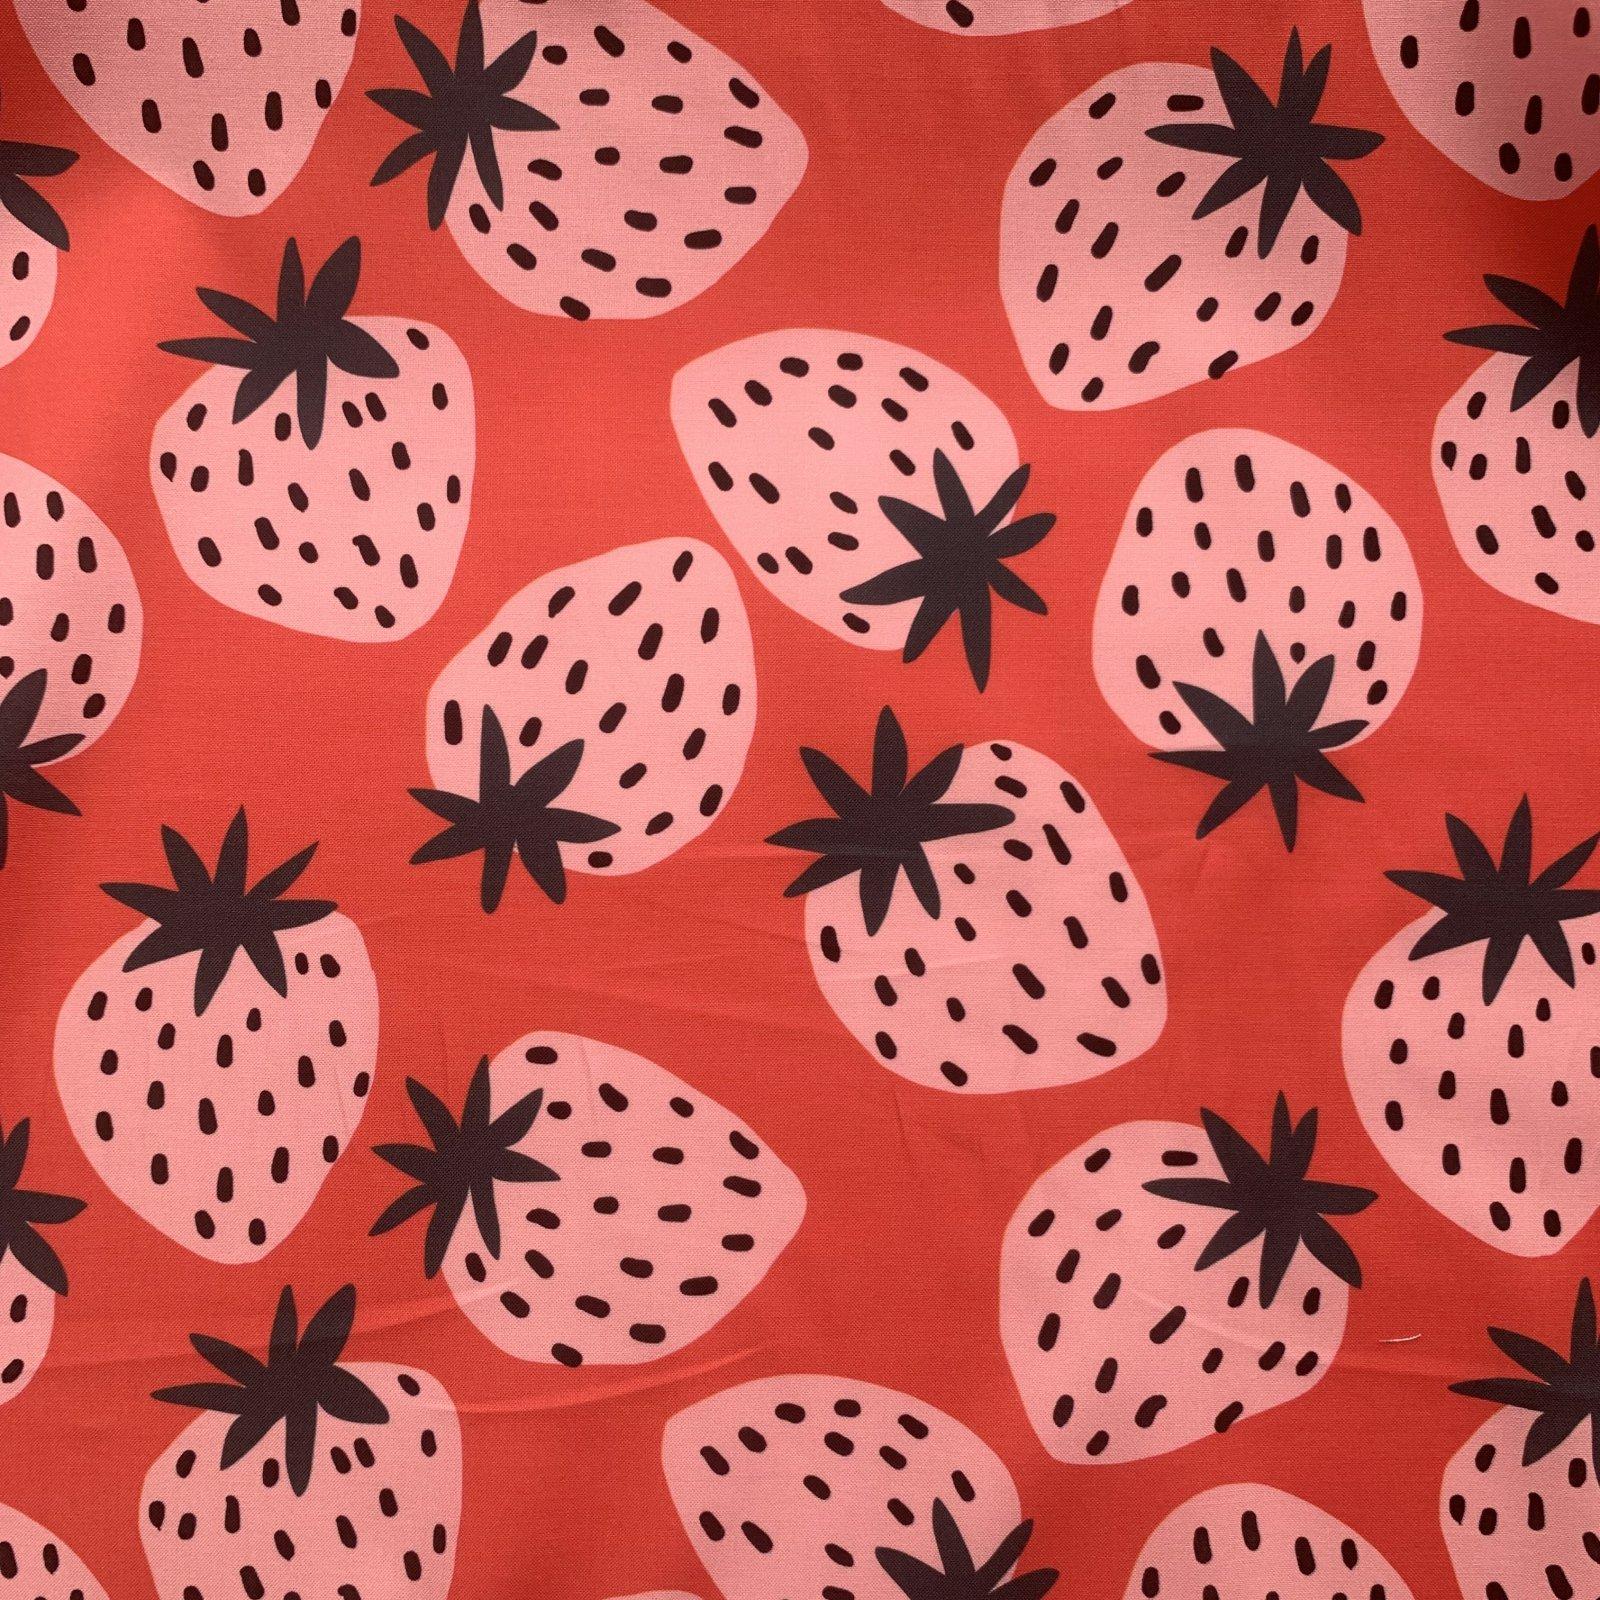 REMNANT Jennifer Bouron Strawberries Mid-Weight Cotton 59 - 3/4 yard